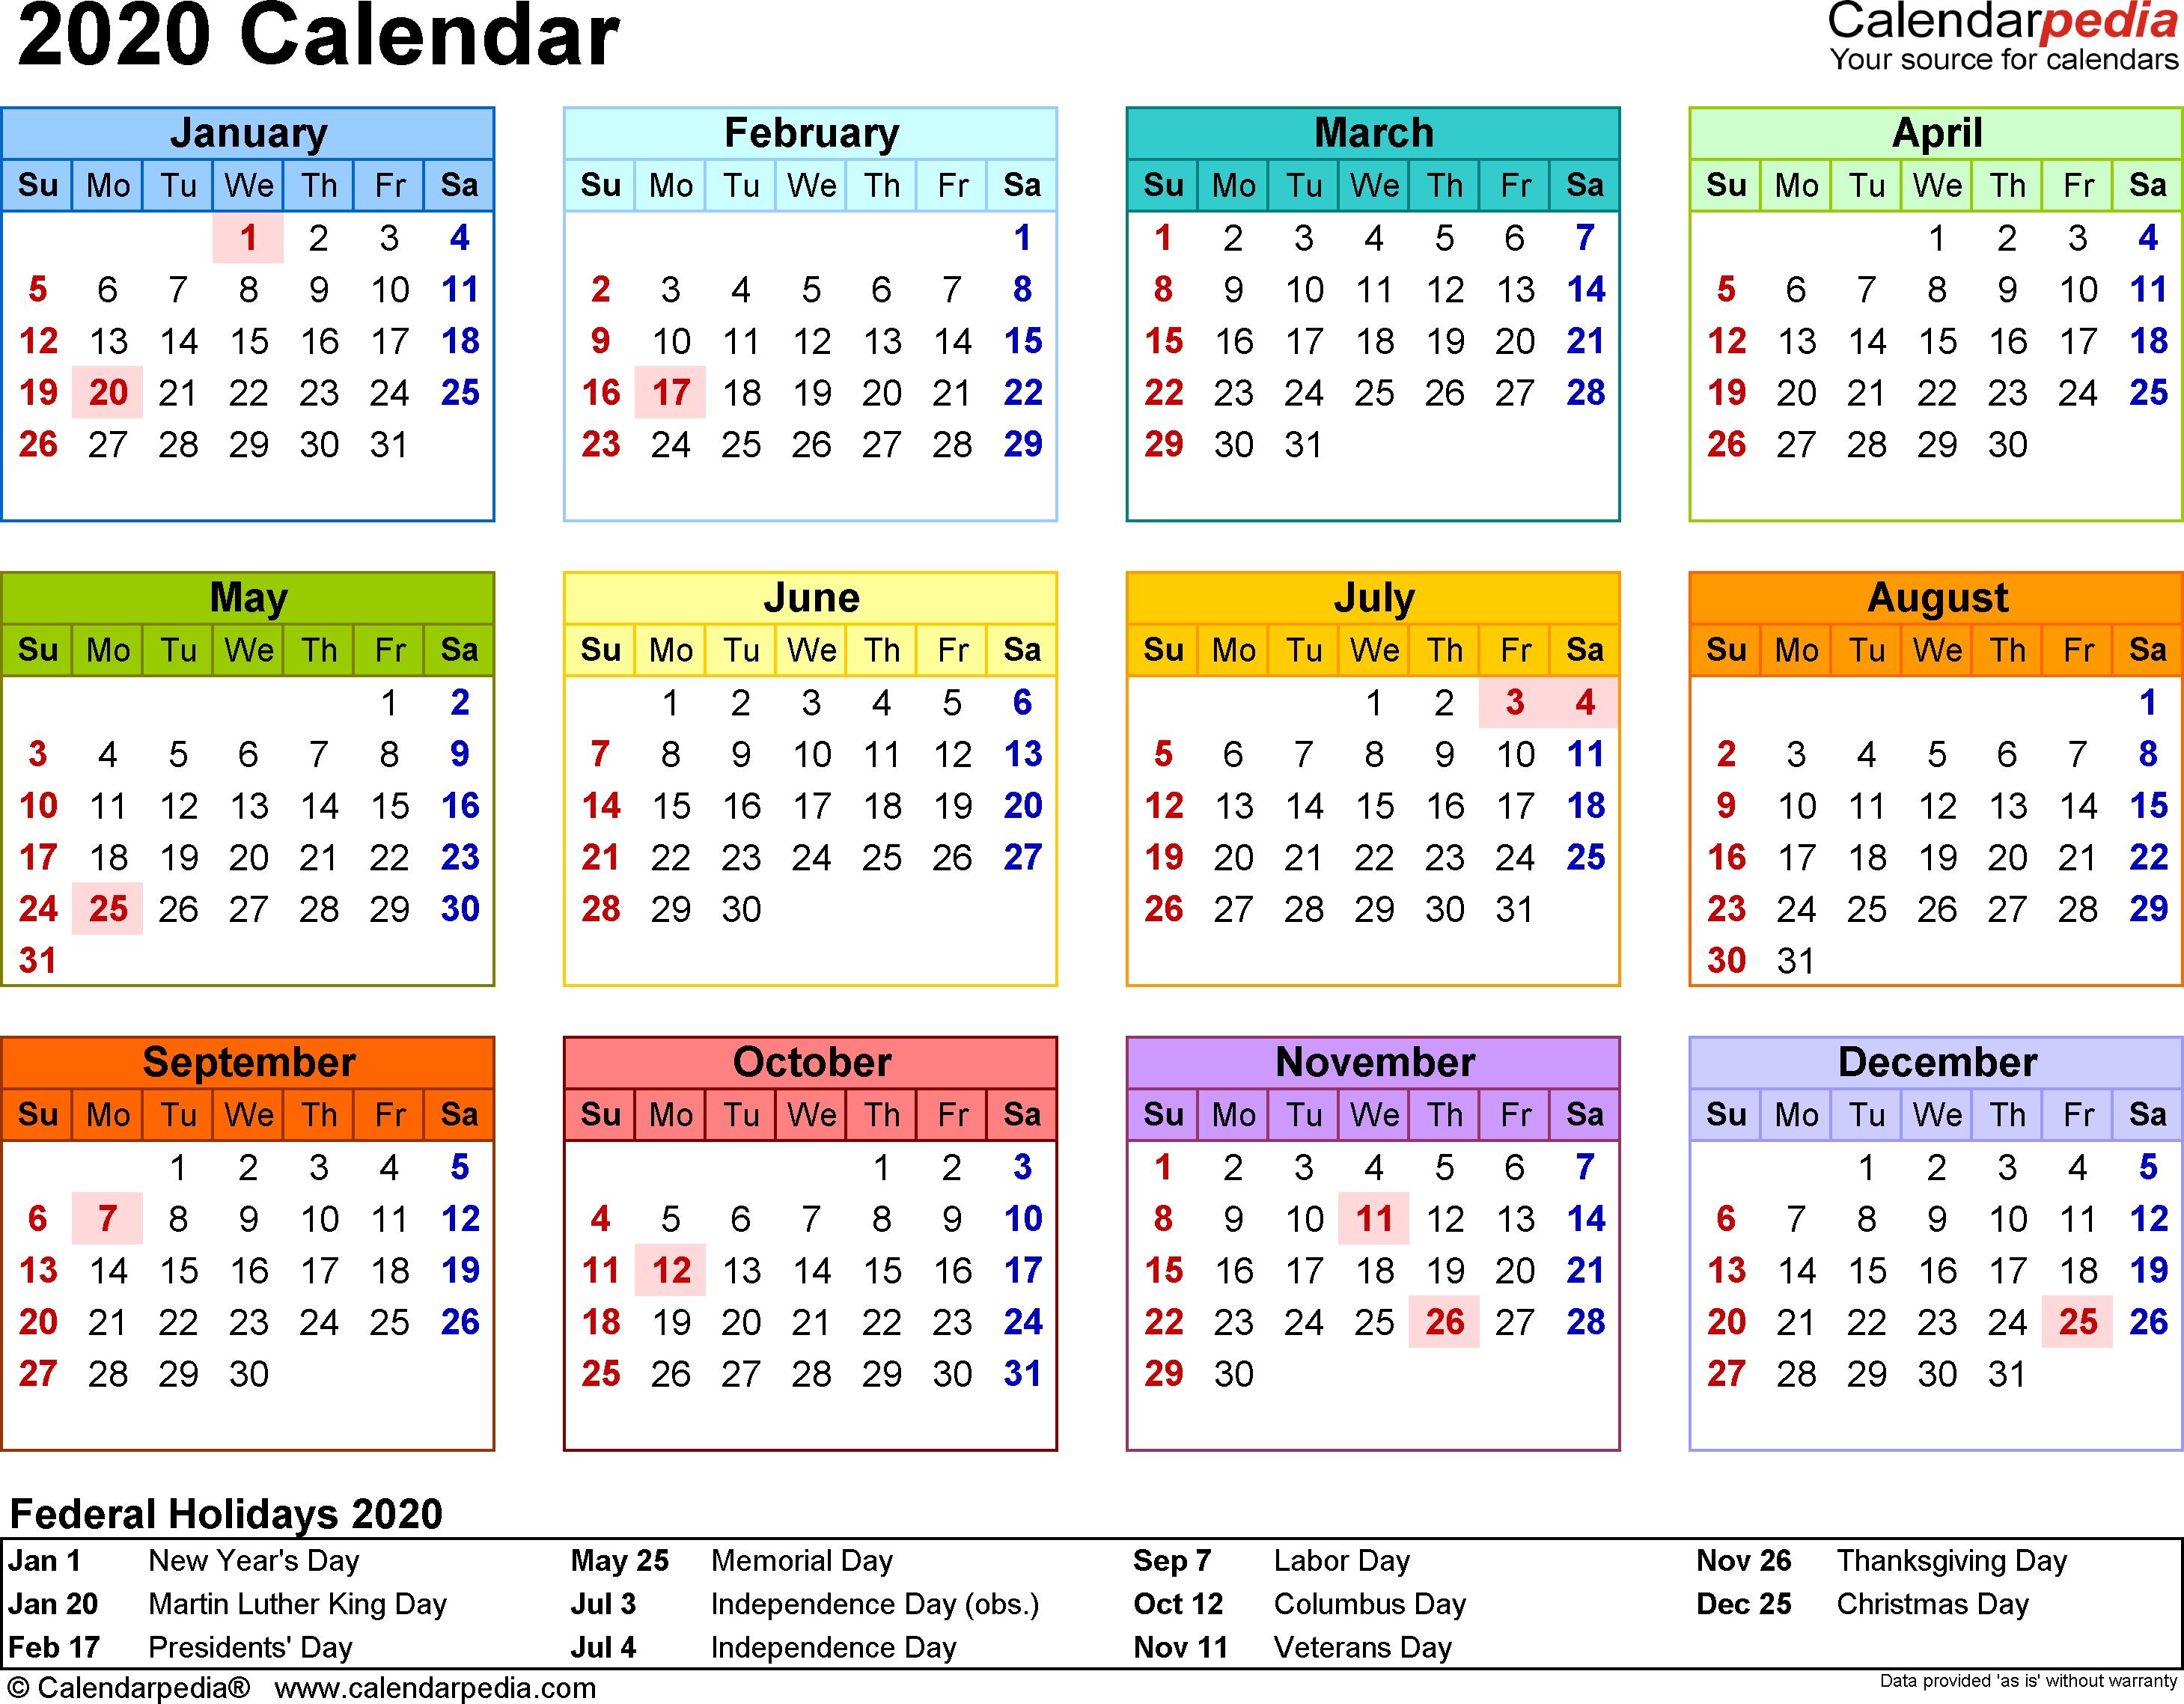 2020 Calendar - 17 Free Printable Word Calendar Templates Impressive 2020 Calendar 3 Months Per Page